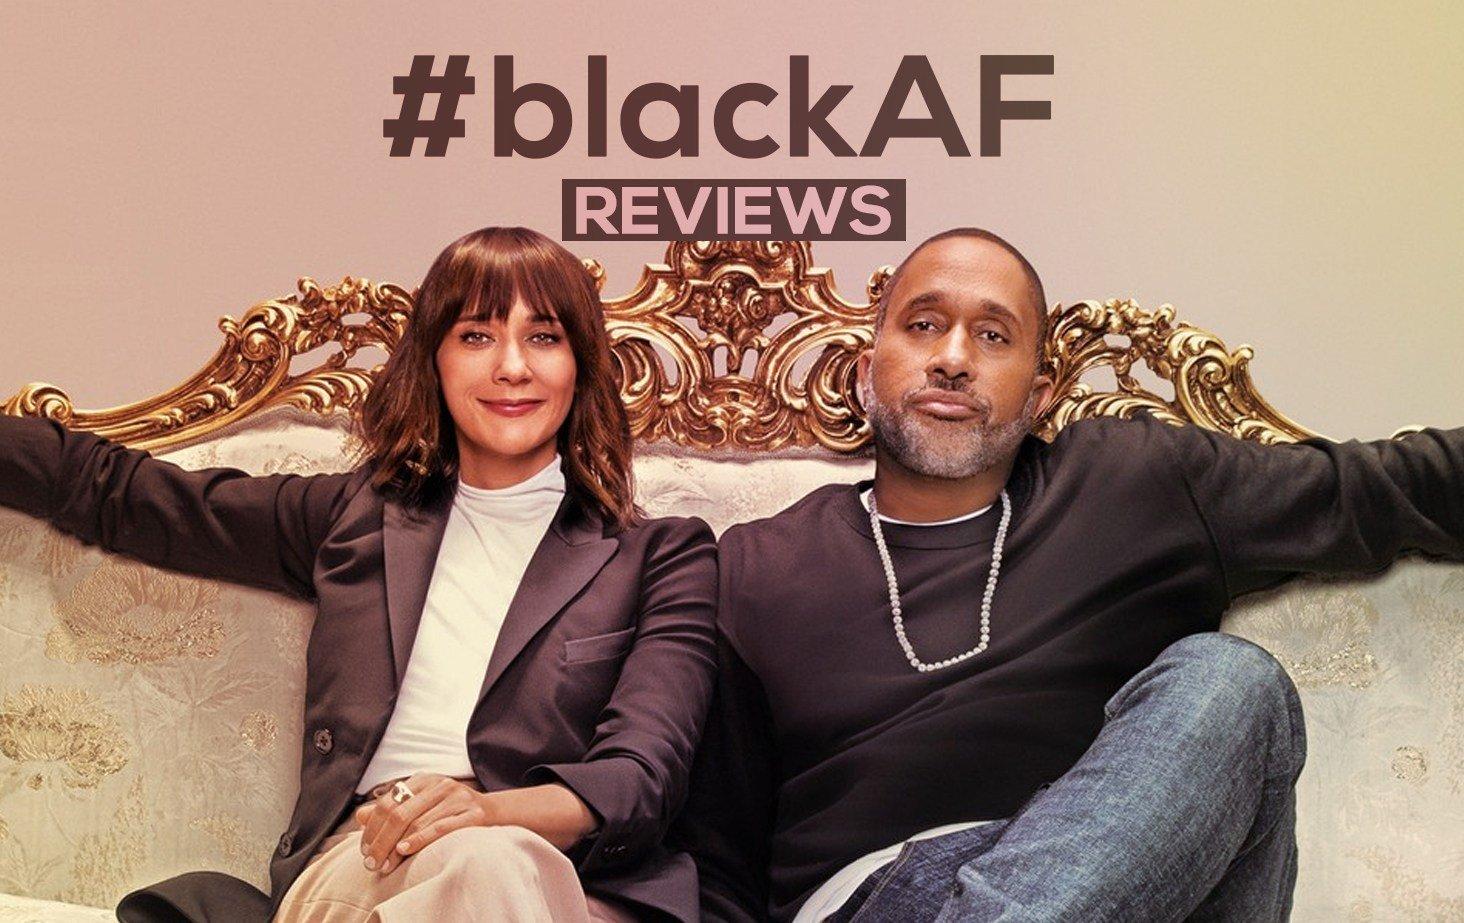 #blackaf, rashida jones, kenya barris, diversity, hollywood, inclusive, marketing, upcoming productions, tv shows, films